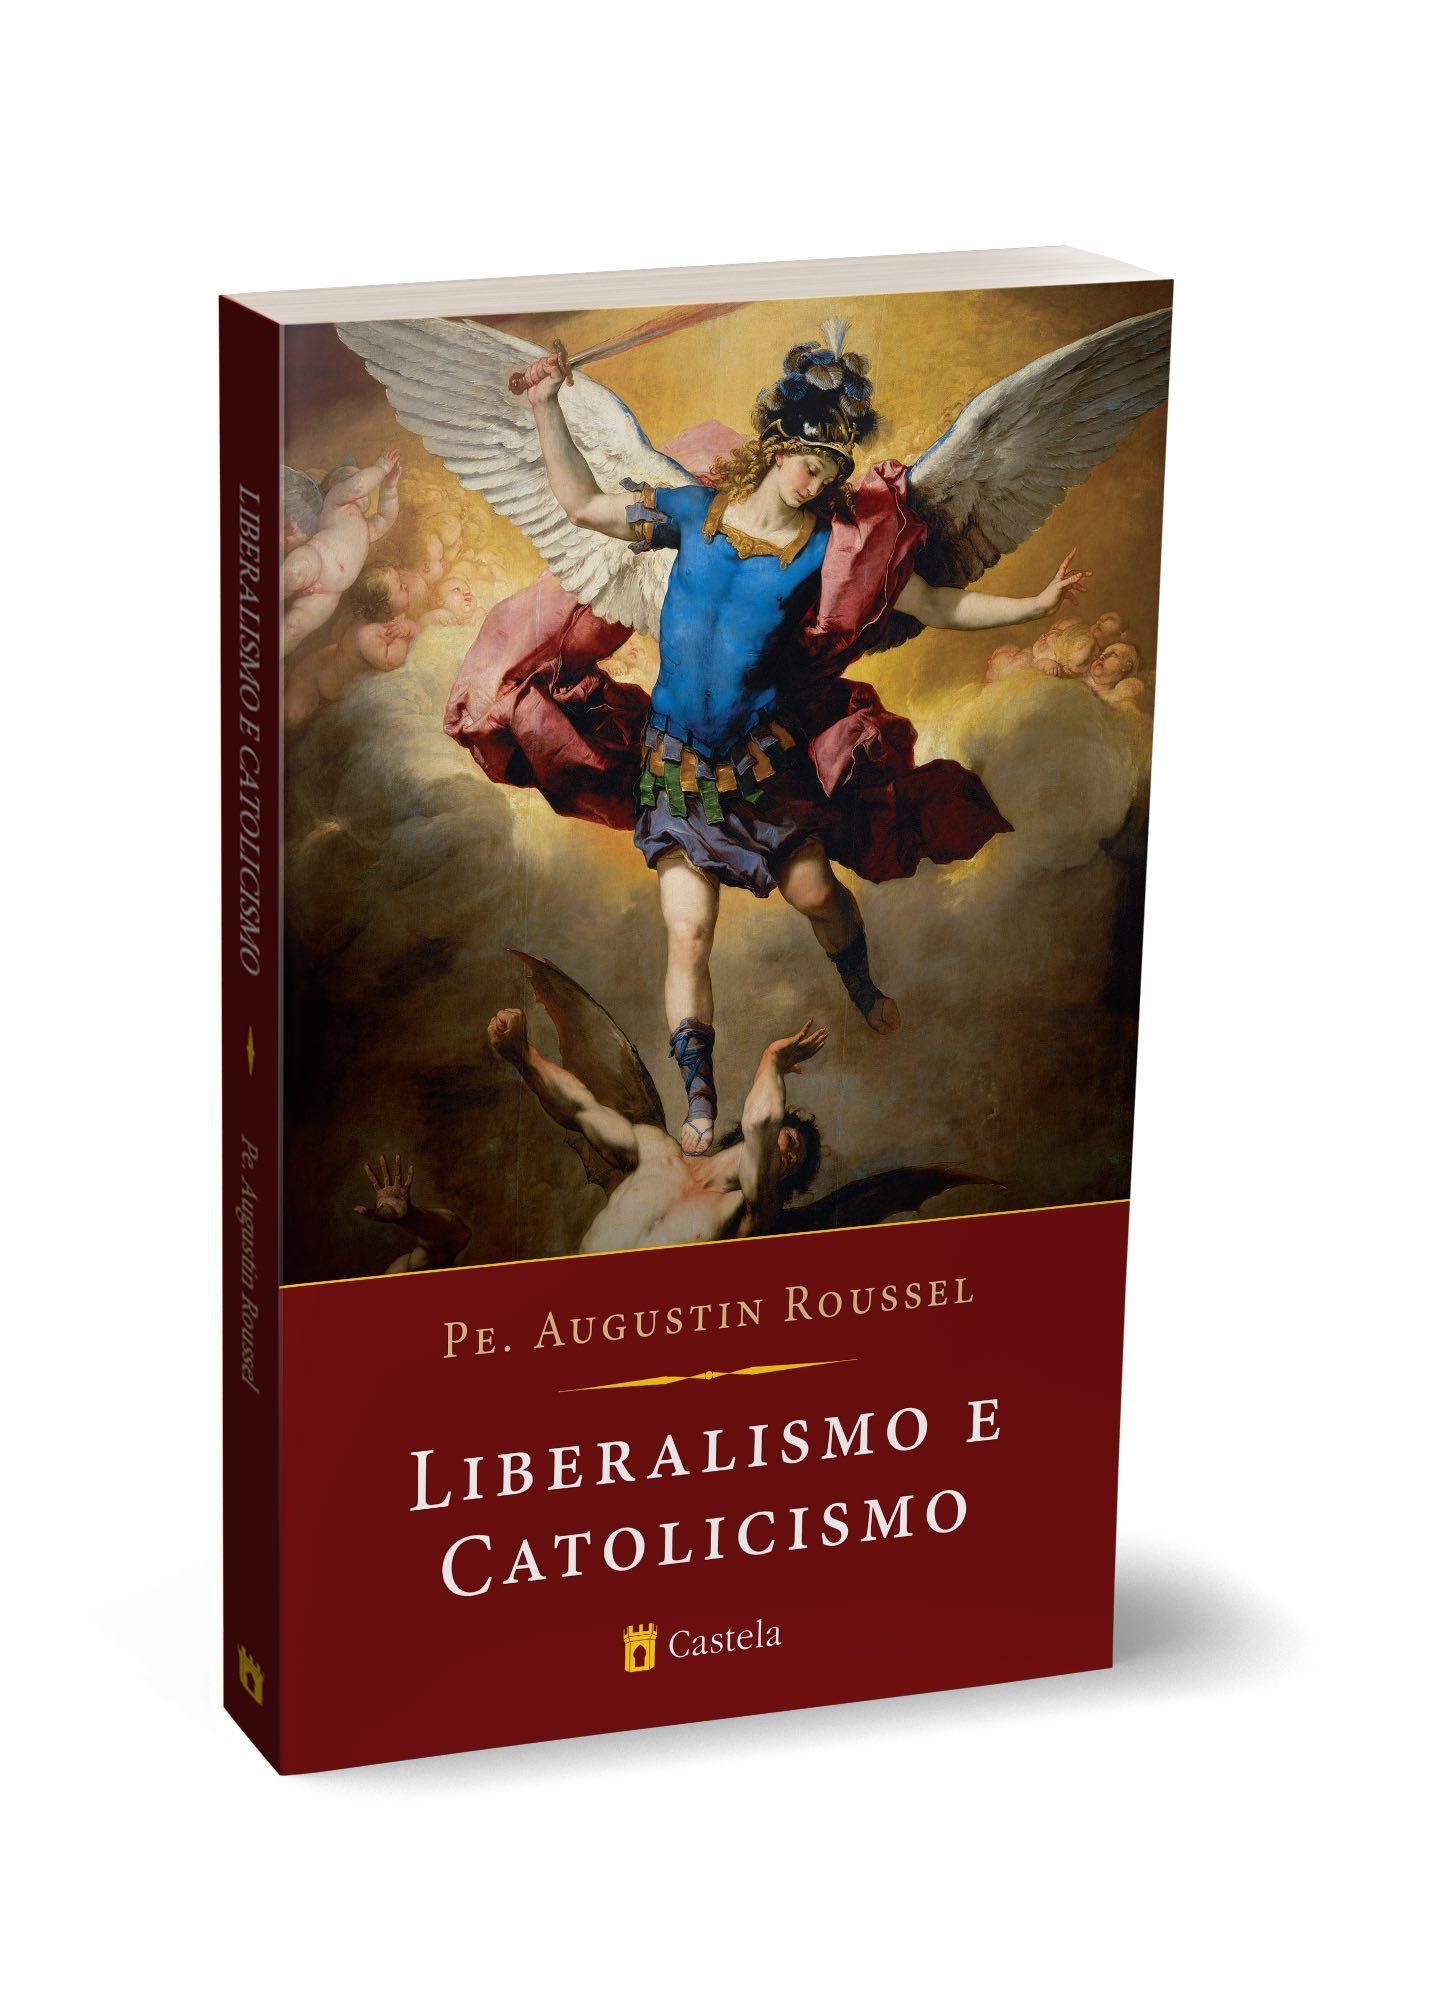 Liberalismo e Catolicismo - Pe. Augustin Roussel